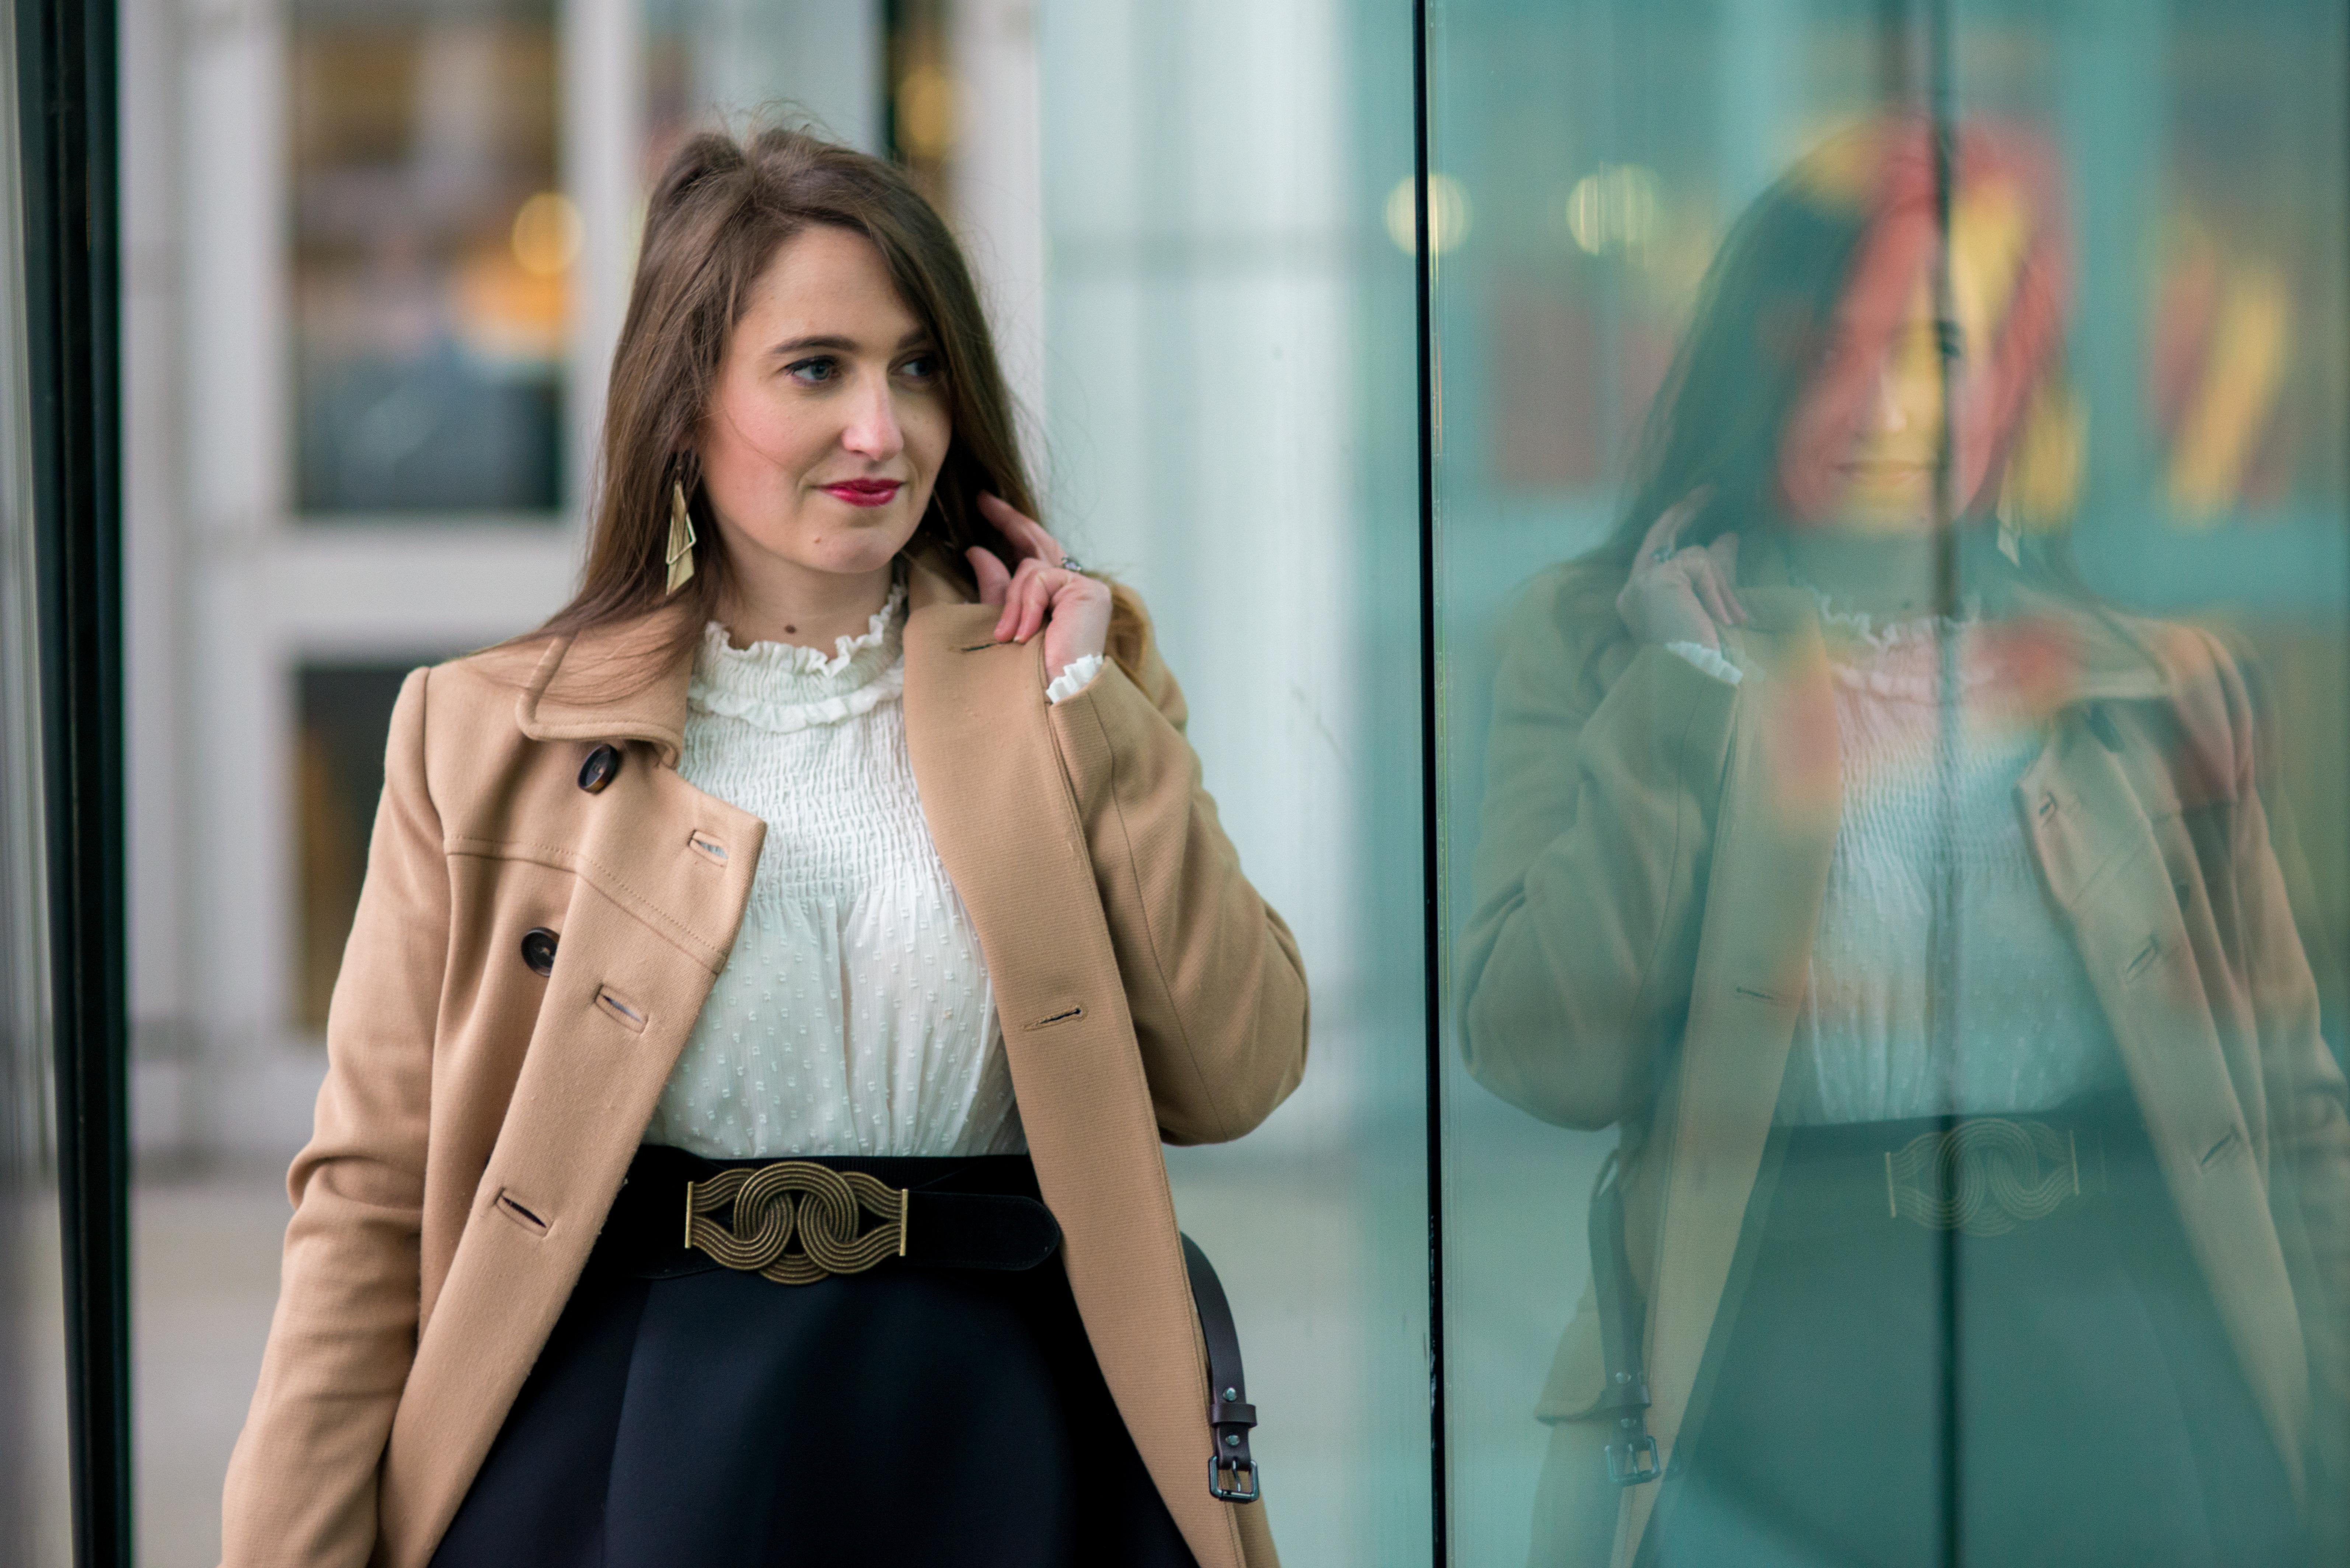 style-sophistique-modele-grandearche-ladefense-paris-fashionblogger-influencer-blouse-zara-seralynepointcom-ump_6727